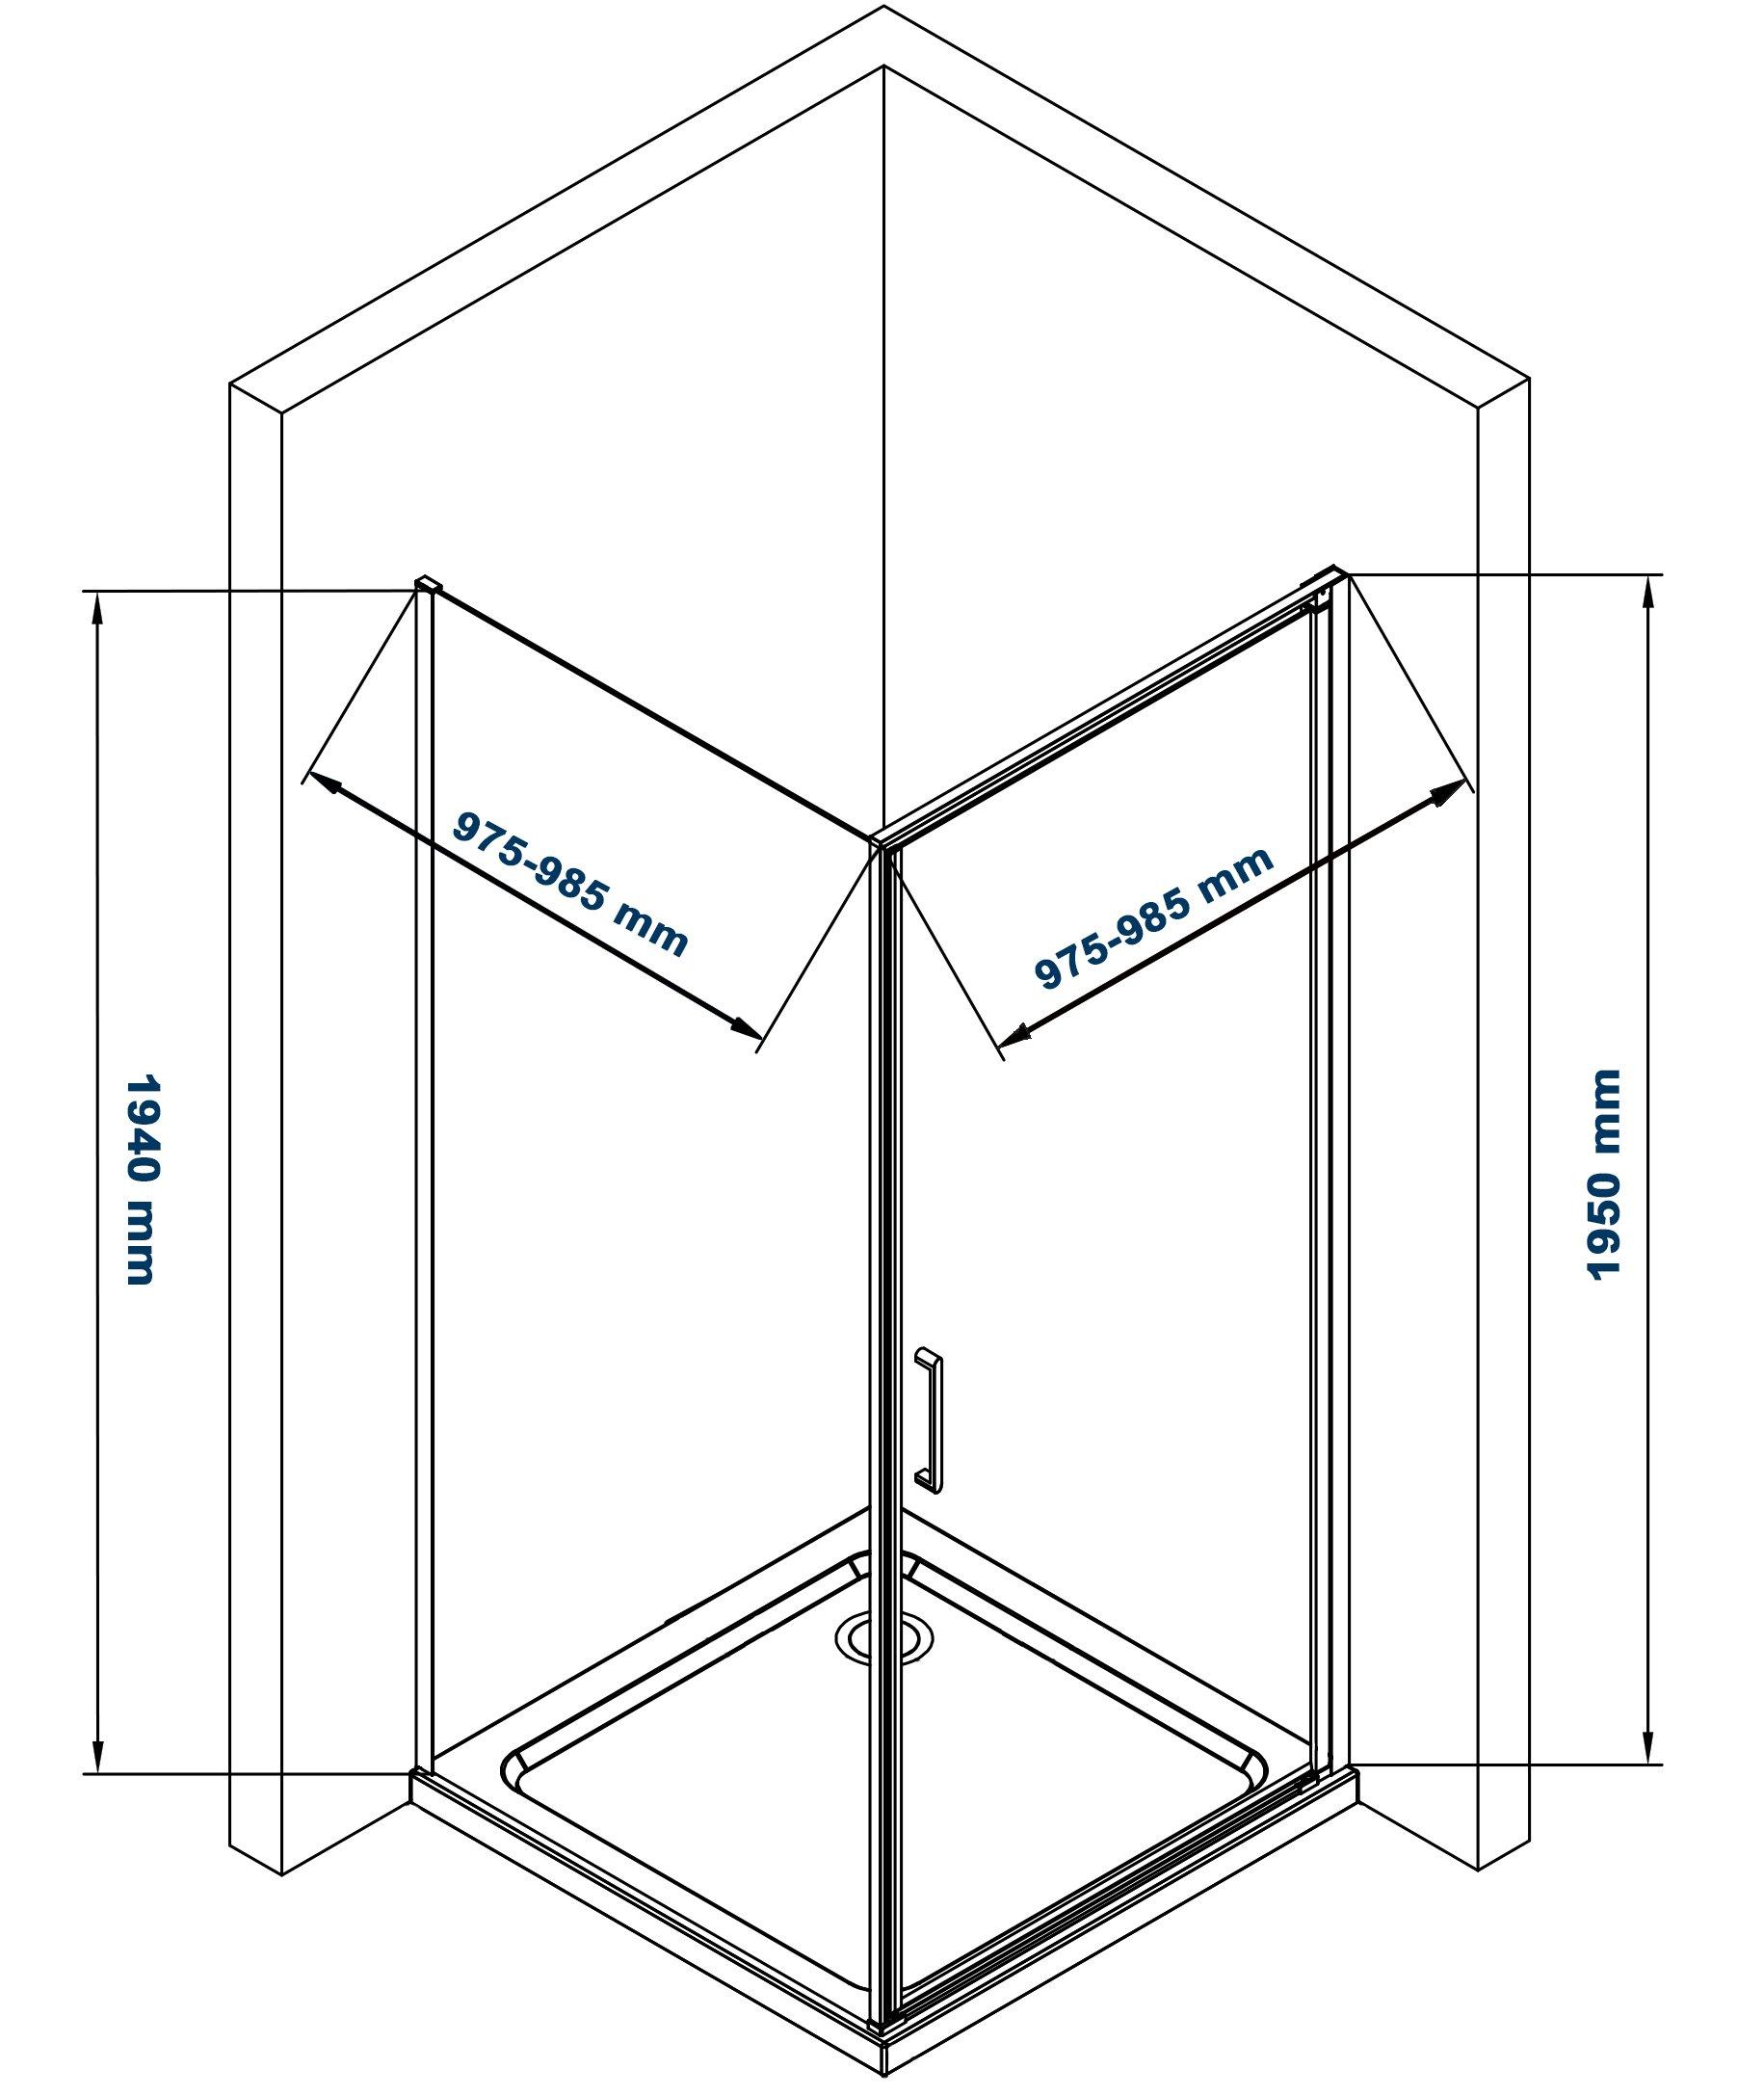 Duschkabine Eckdusche Nano 6mm Echtglas EX416S - 100 x 100 x 195 cm zoom thumbnail 5